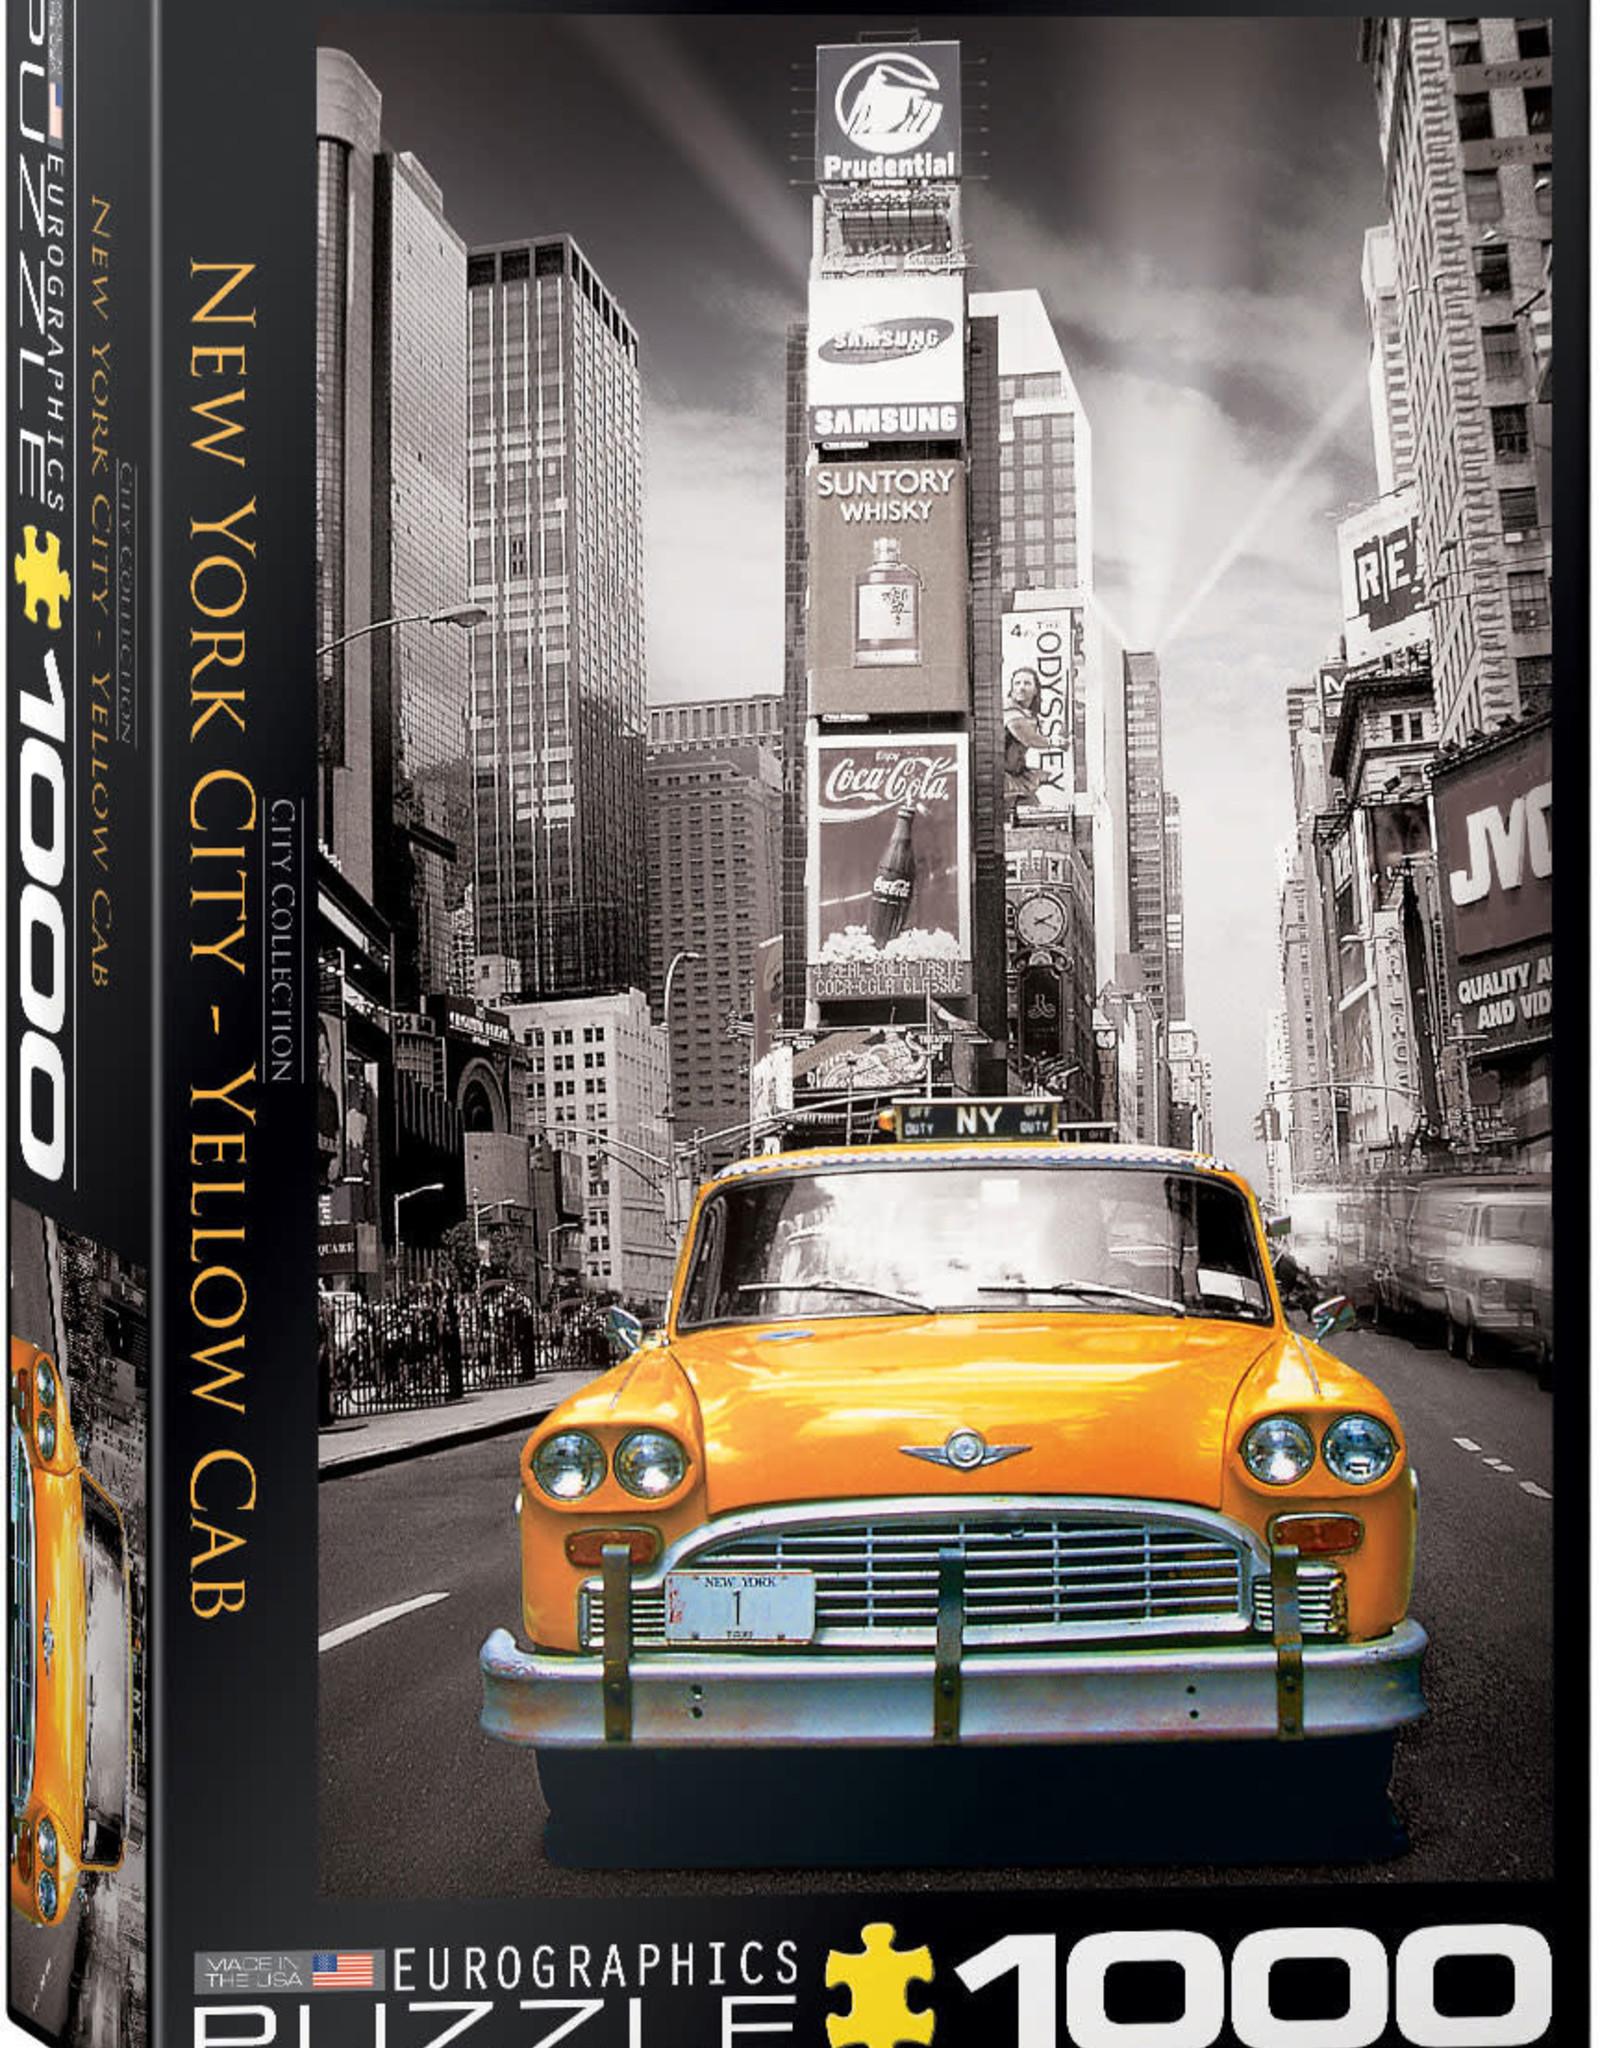 Eurographics New York City - Yellow Cab HDR Photography 1000pc